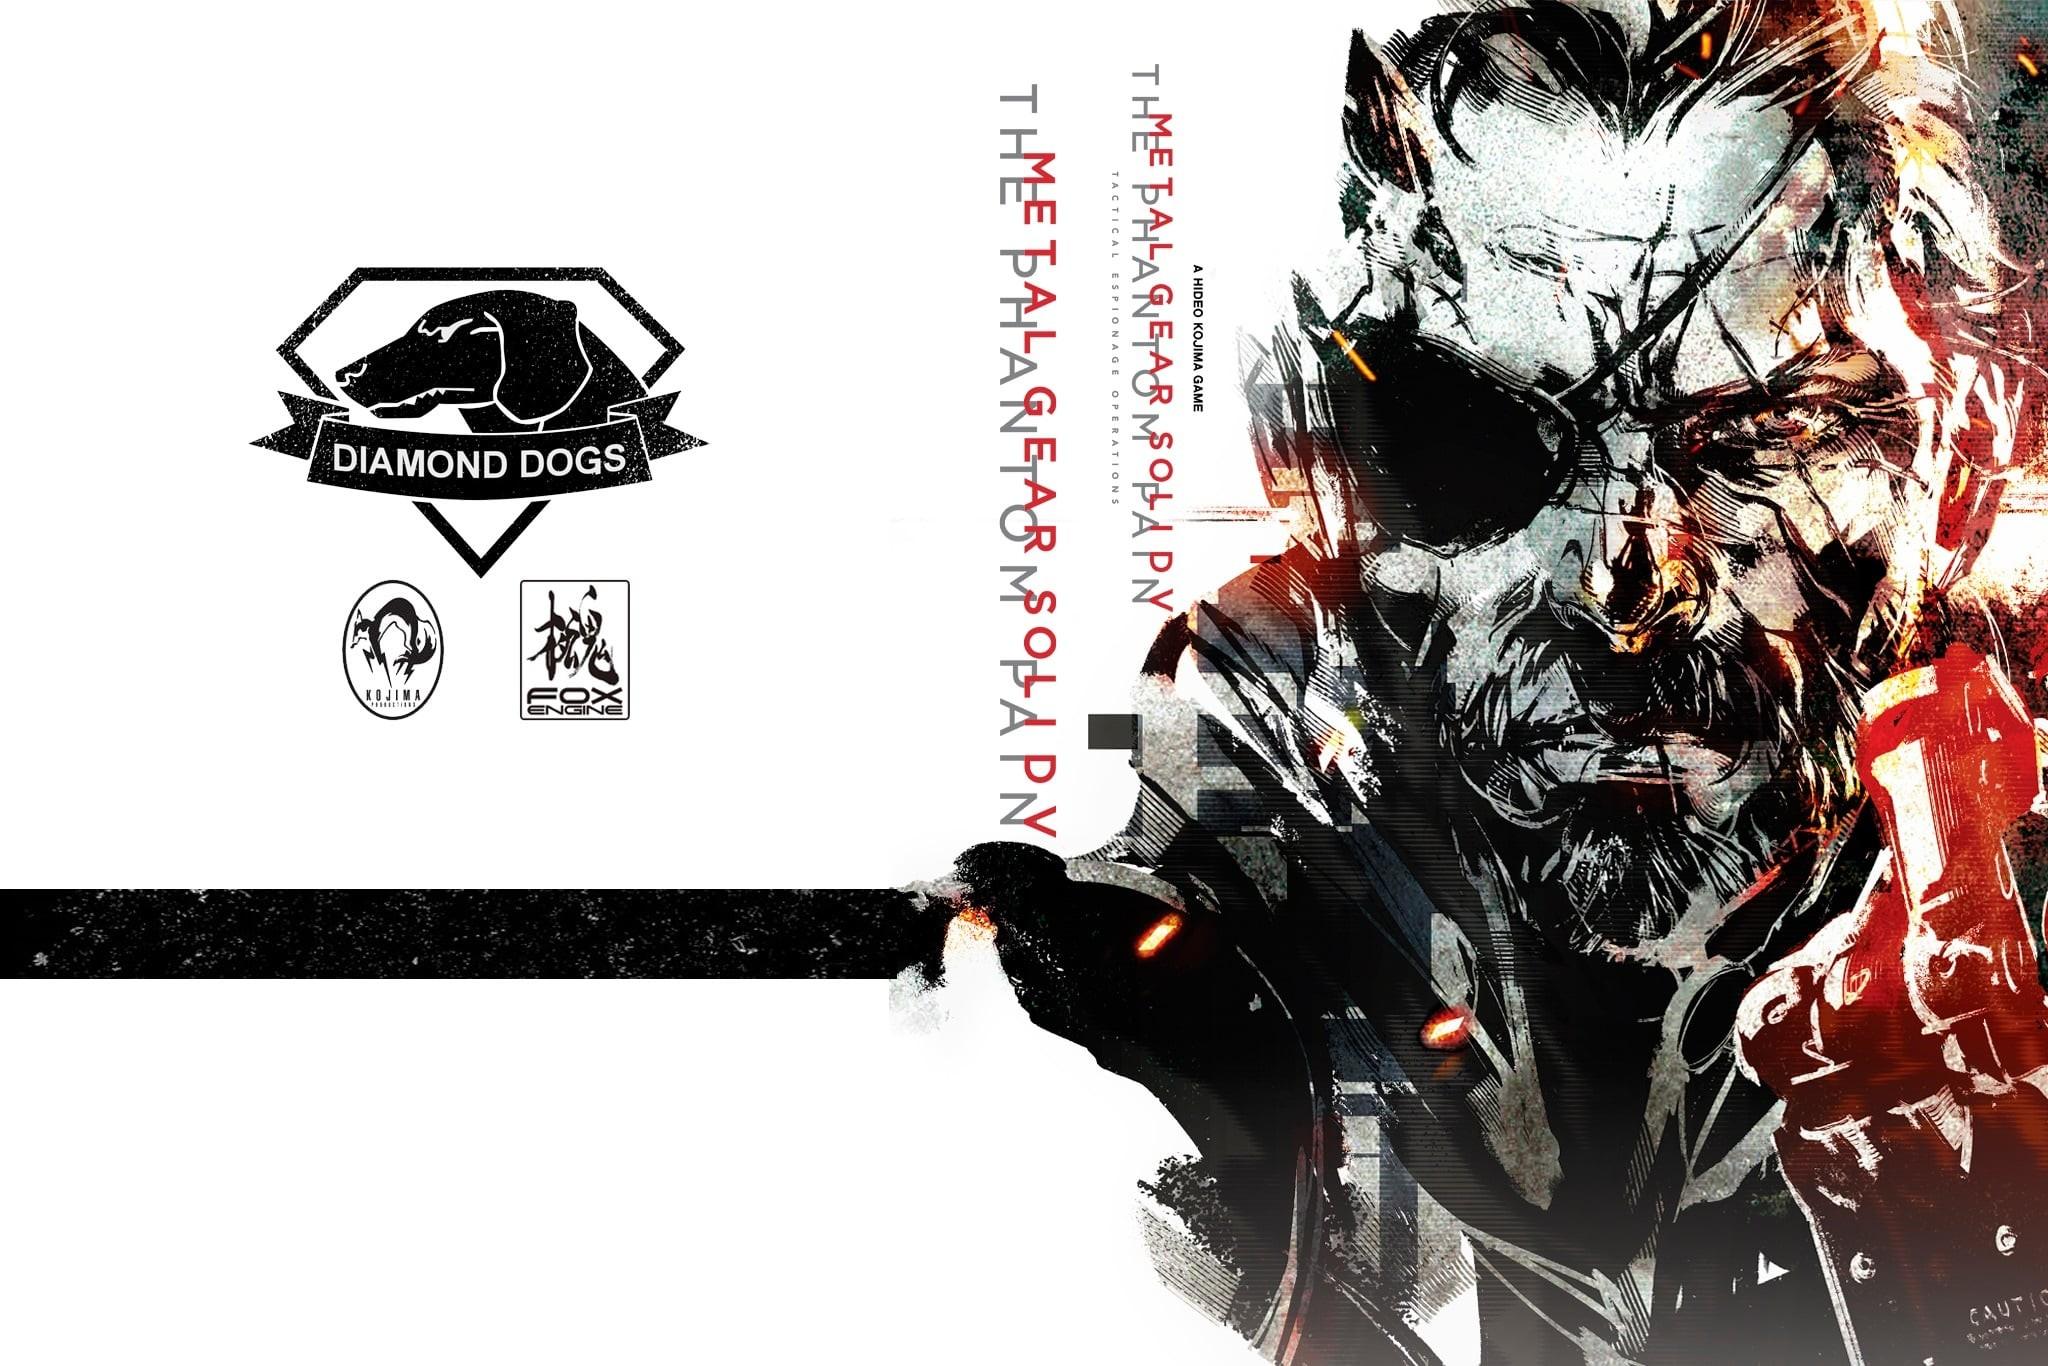 Metal Gear Solid 5 Wallpaper 1080p. All …